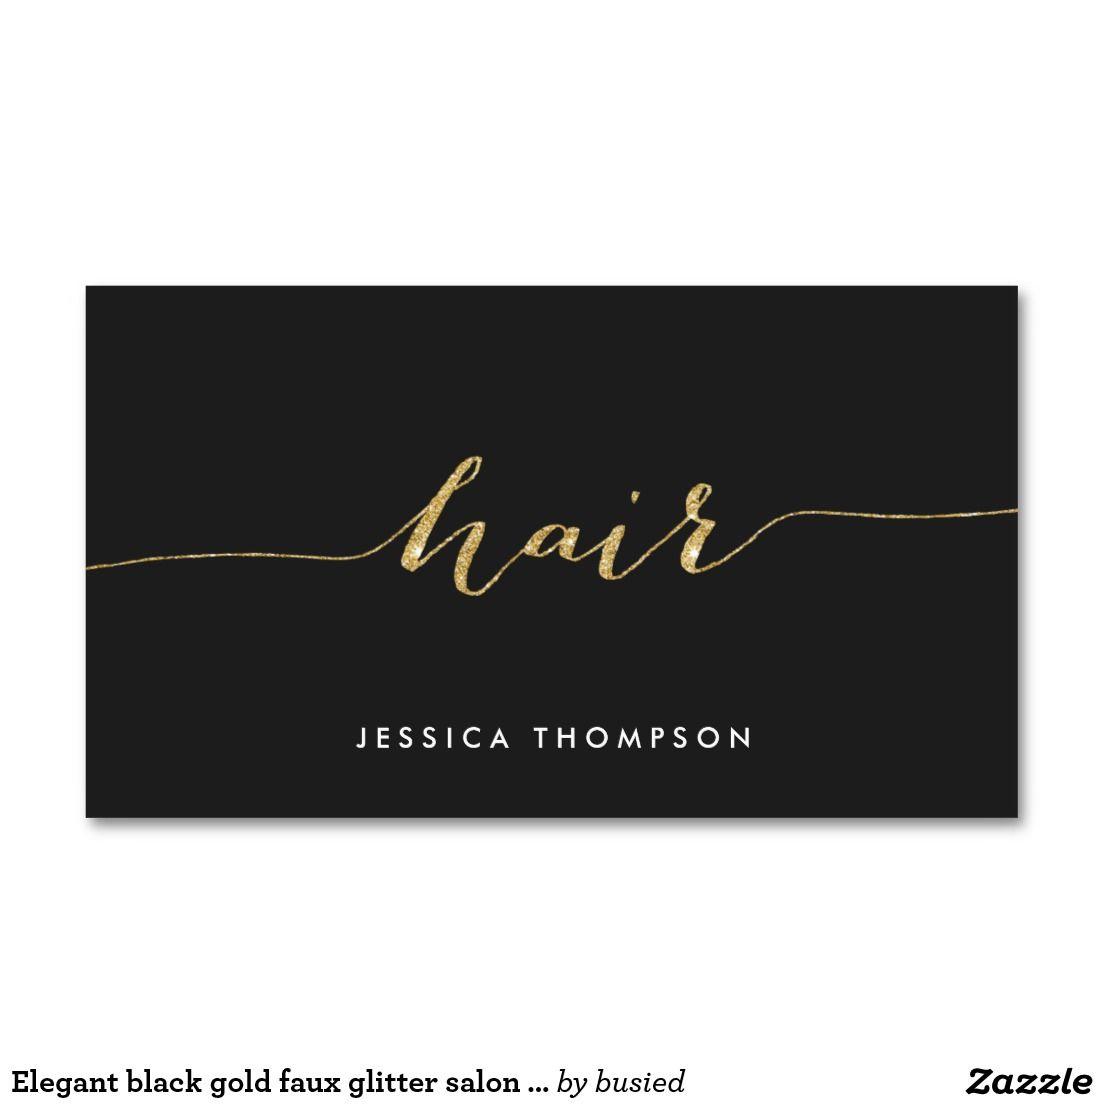 Elegant black gold faux glitter salon hair stylist business card elegant black gold faux glitter salon hair stylist business card magicingreecefo Image collections